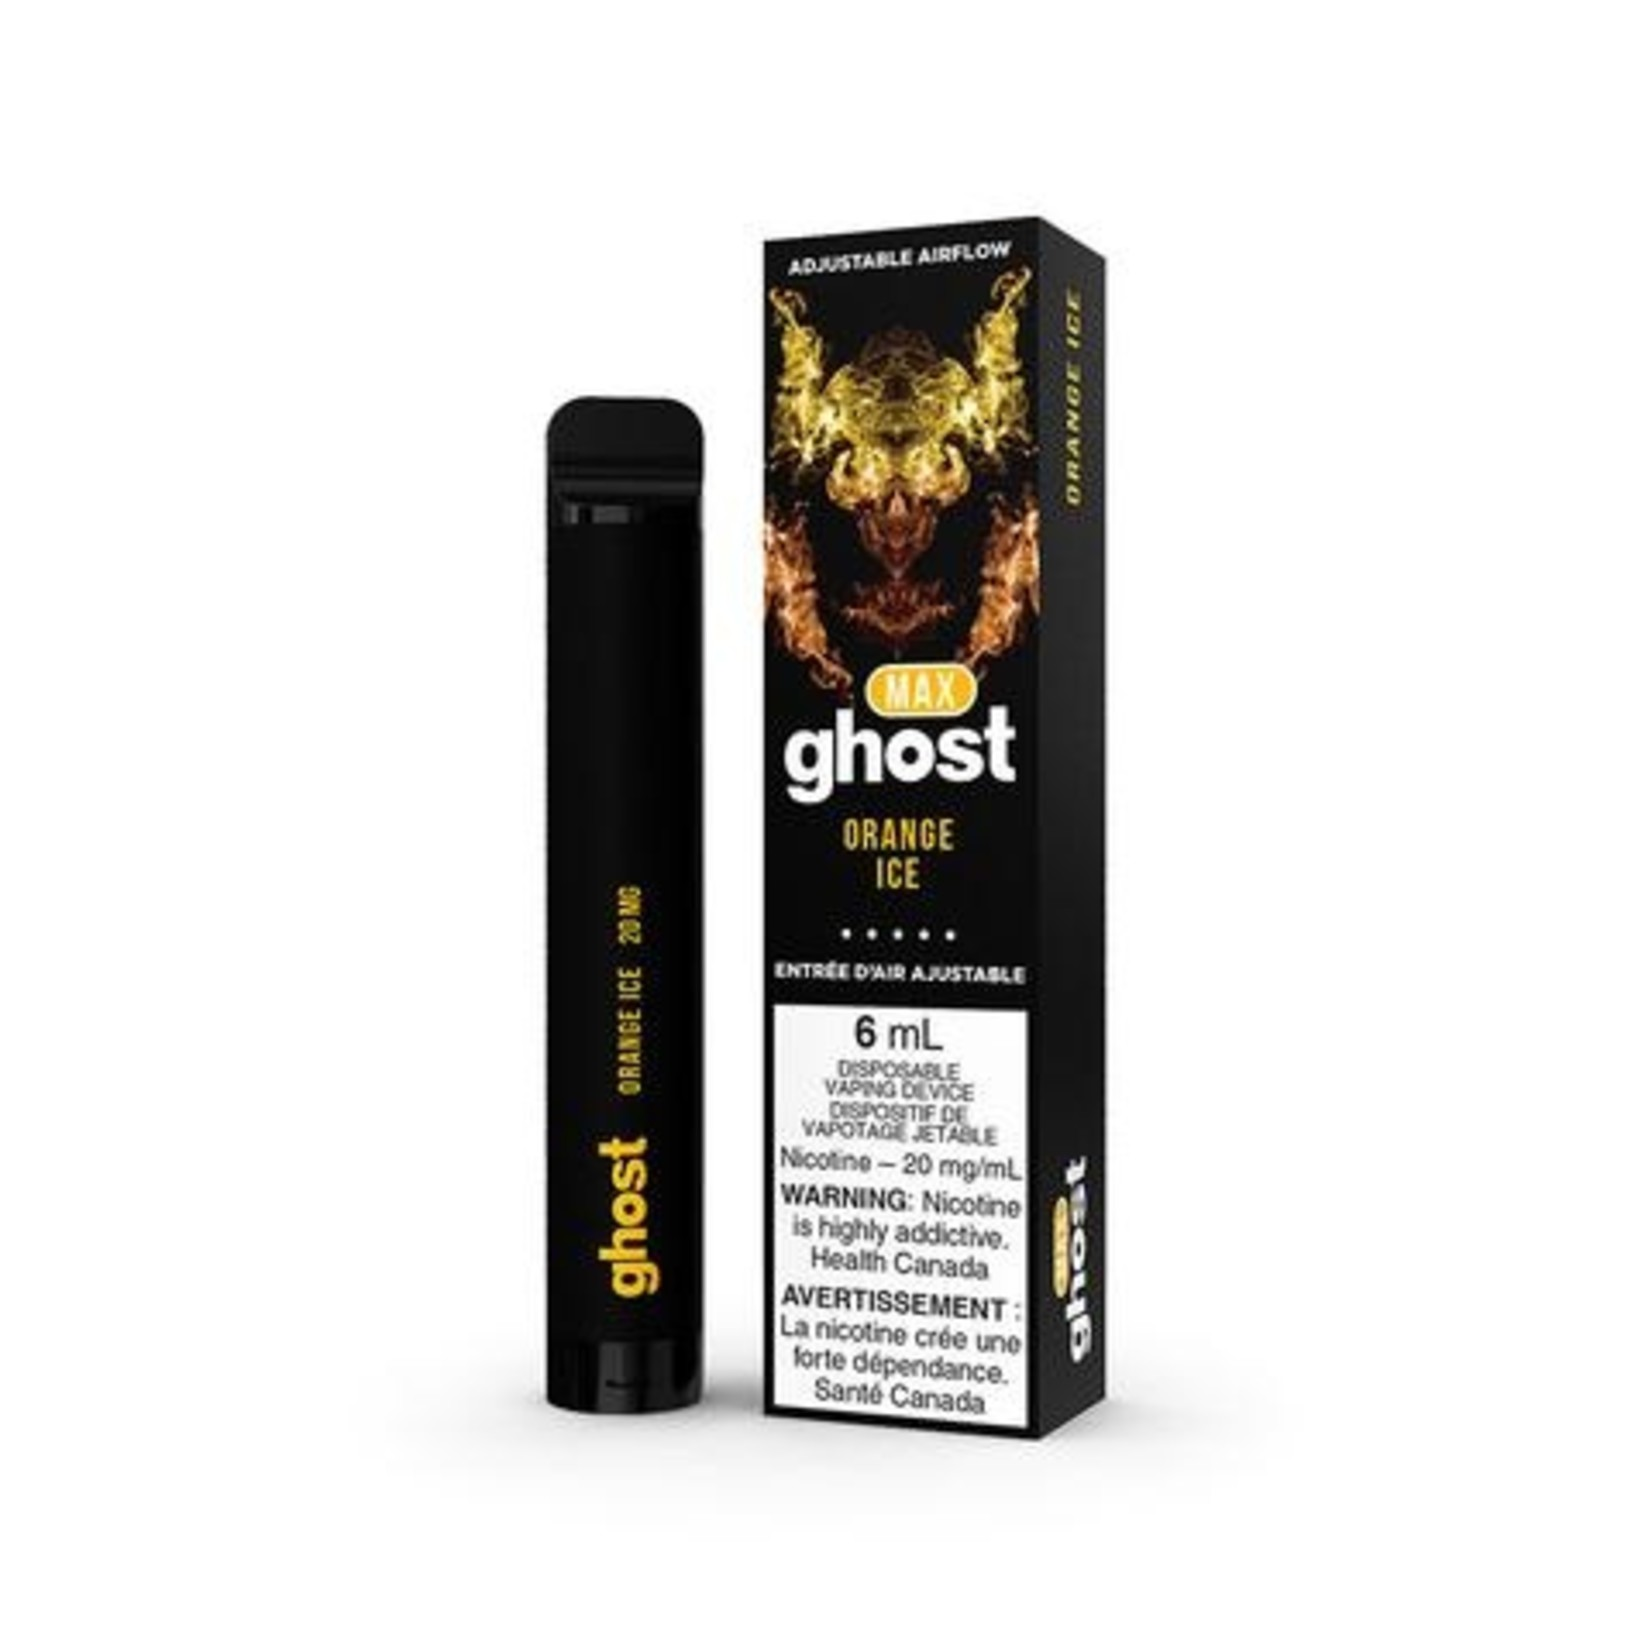 Ghost Max Orange Ice